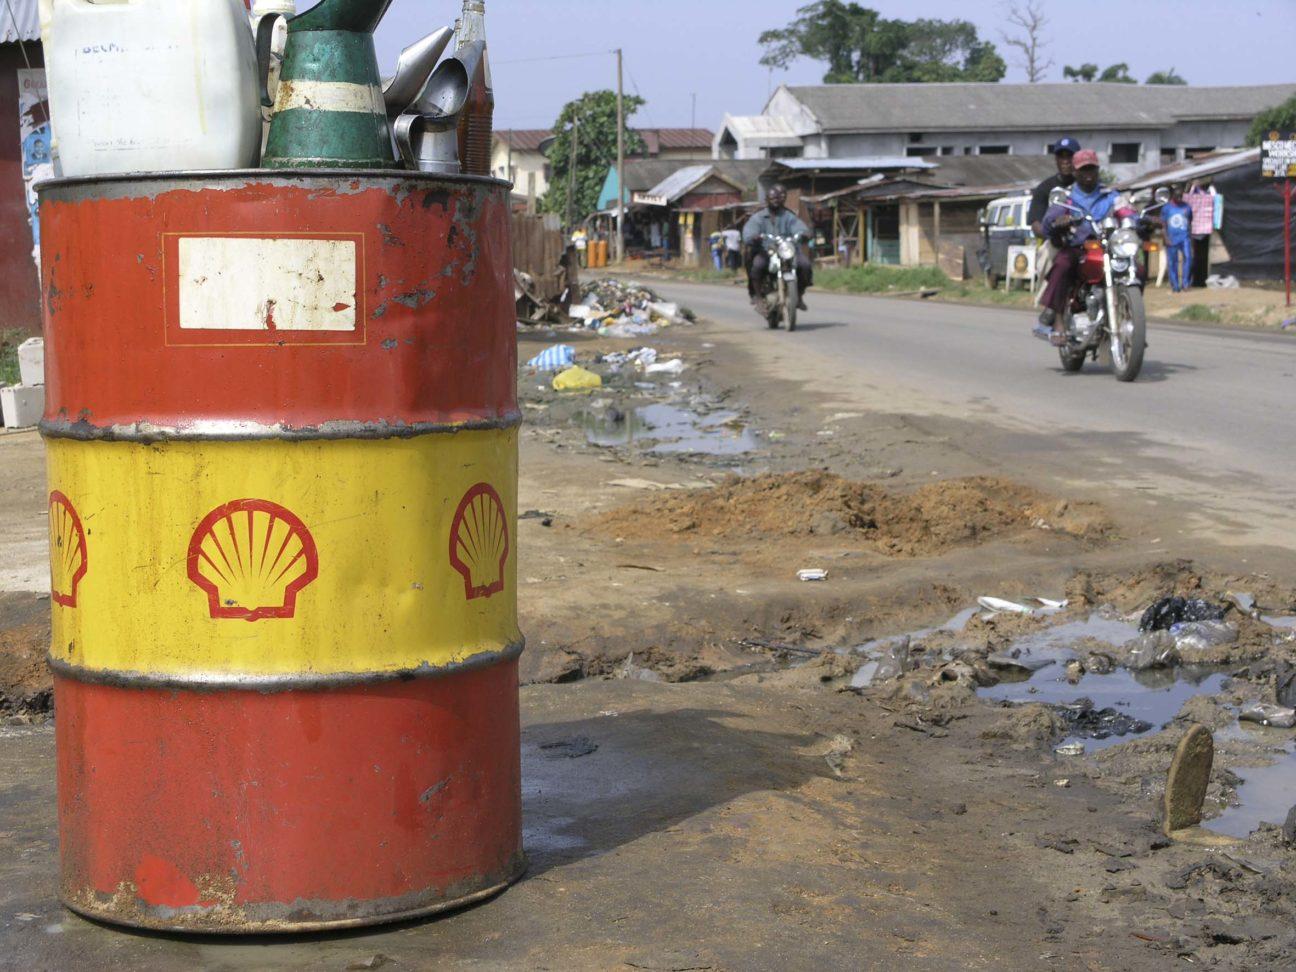 https://www.e-dromos.gr/wp-content/uploads/2018/01/Shell-nigeria.jpg